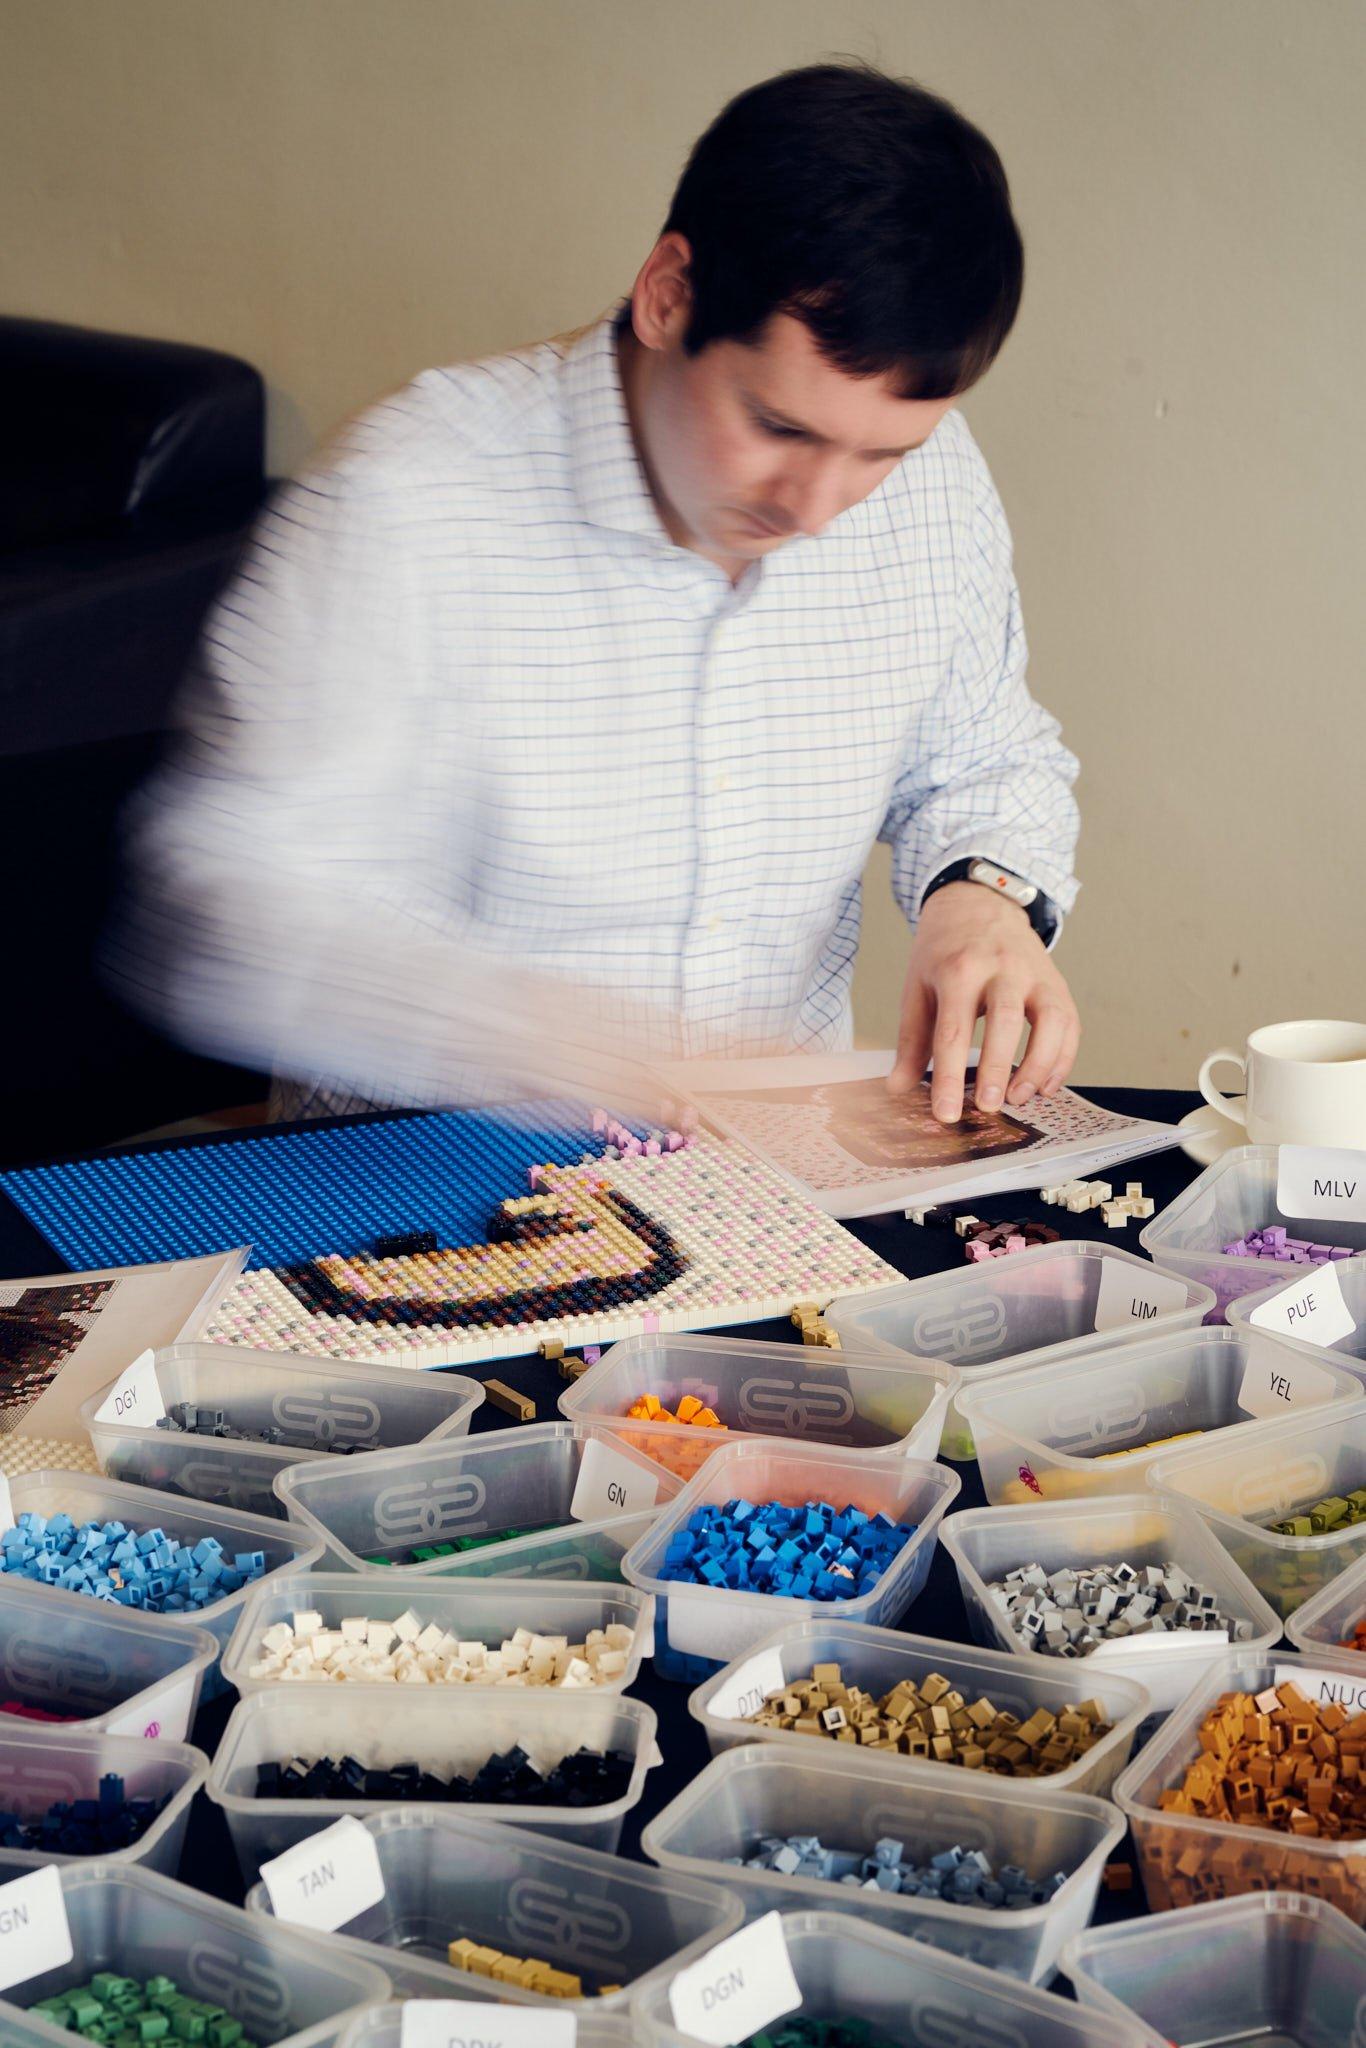 LEGO: Build a Mosaic, at South Bank Centre, London